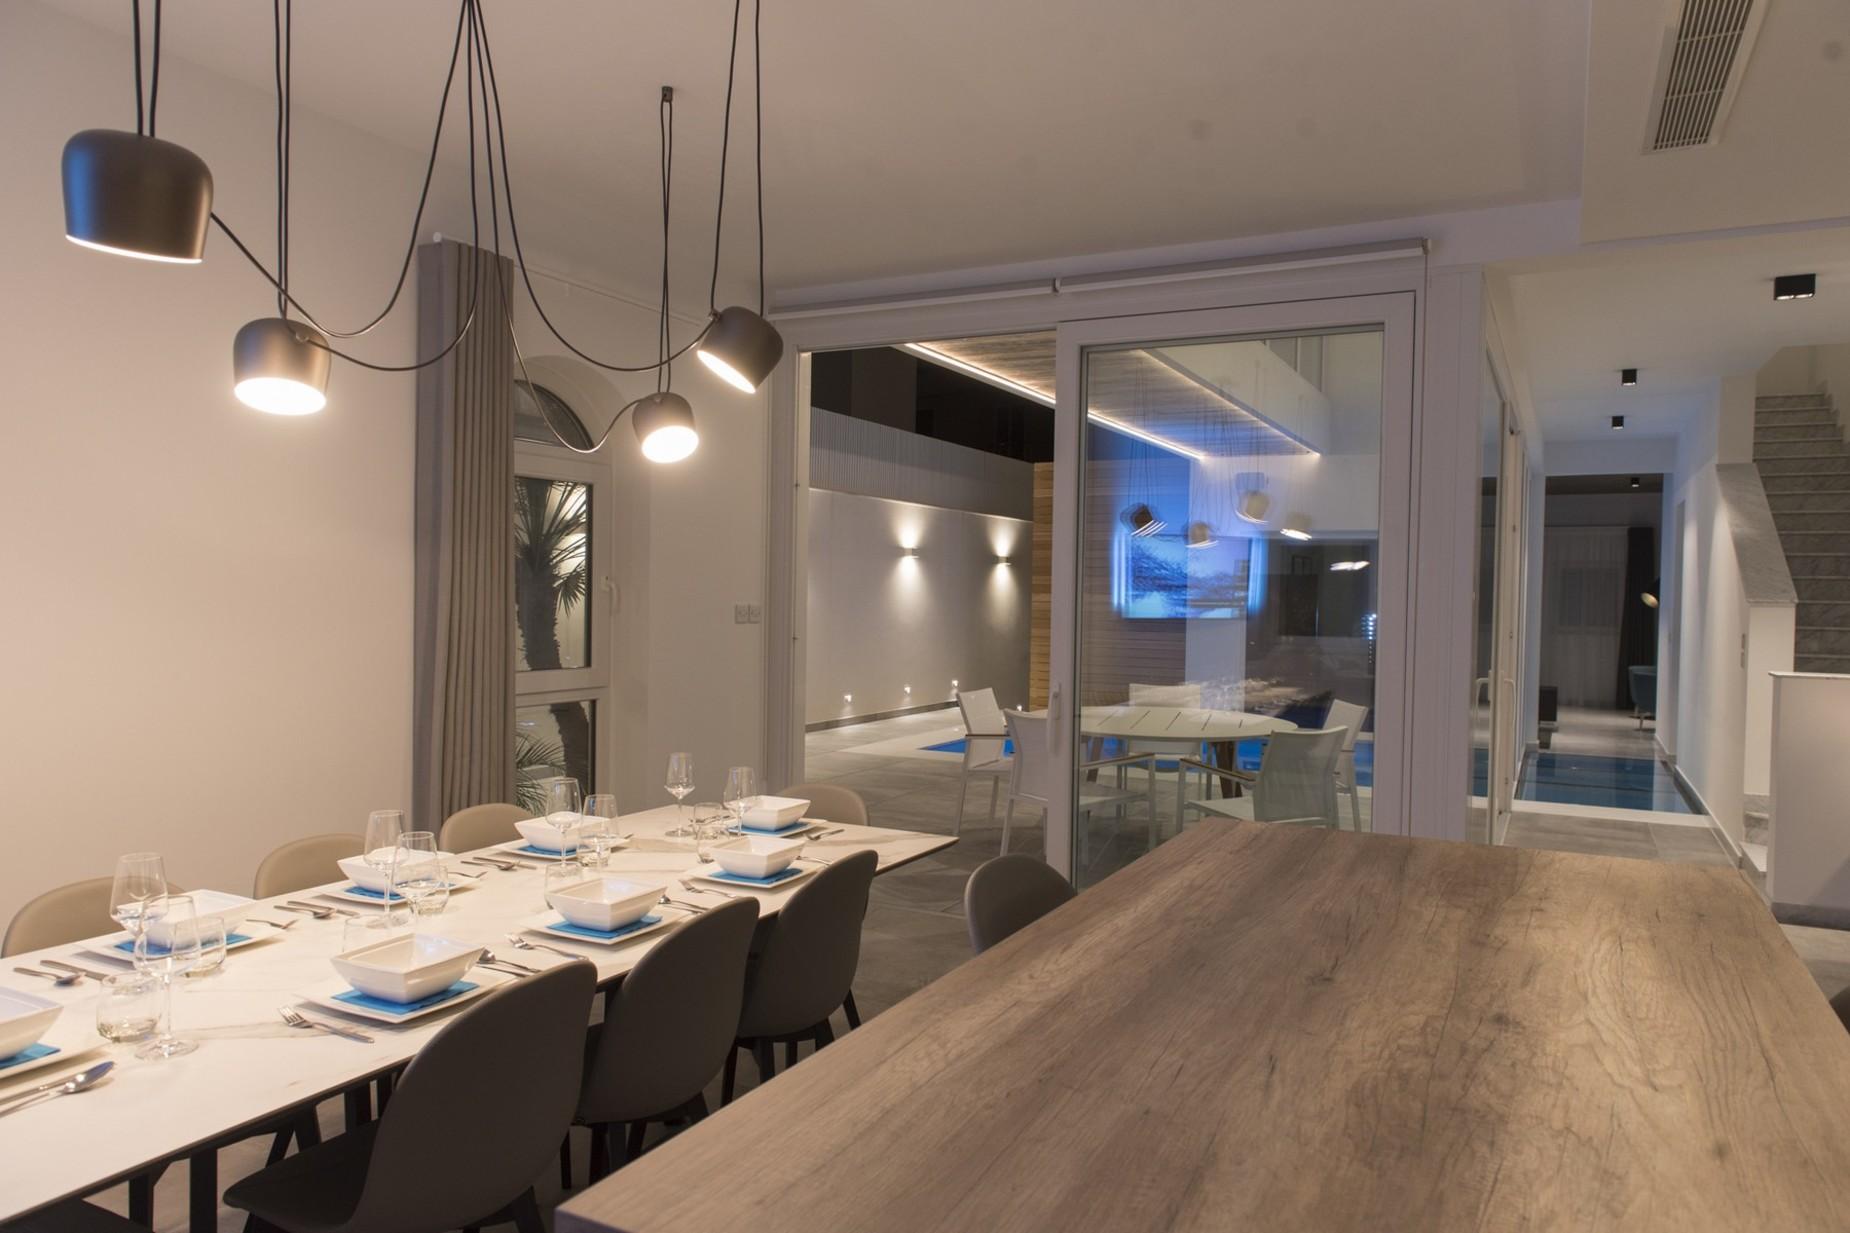 3 bed Villa For Rent in Ibragg, Ibragg - thumb 6